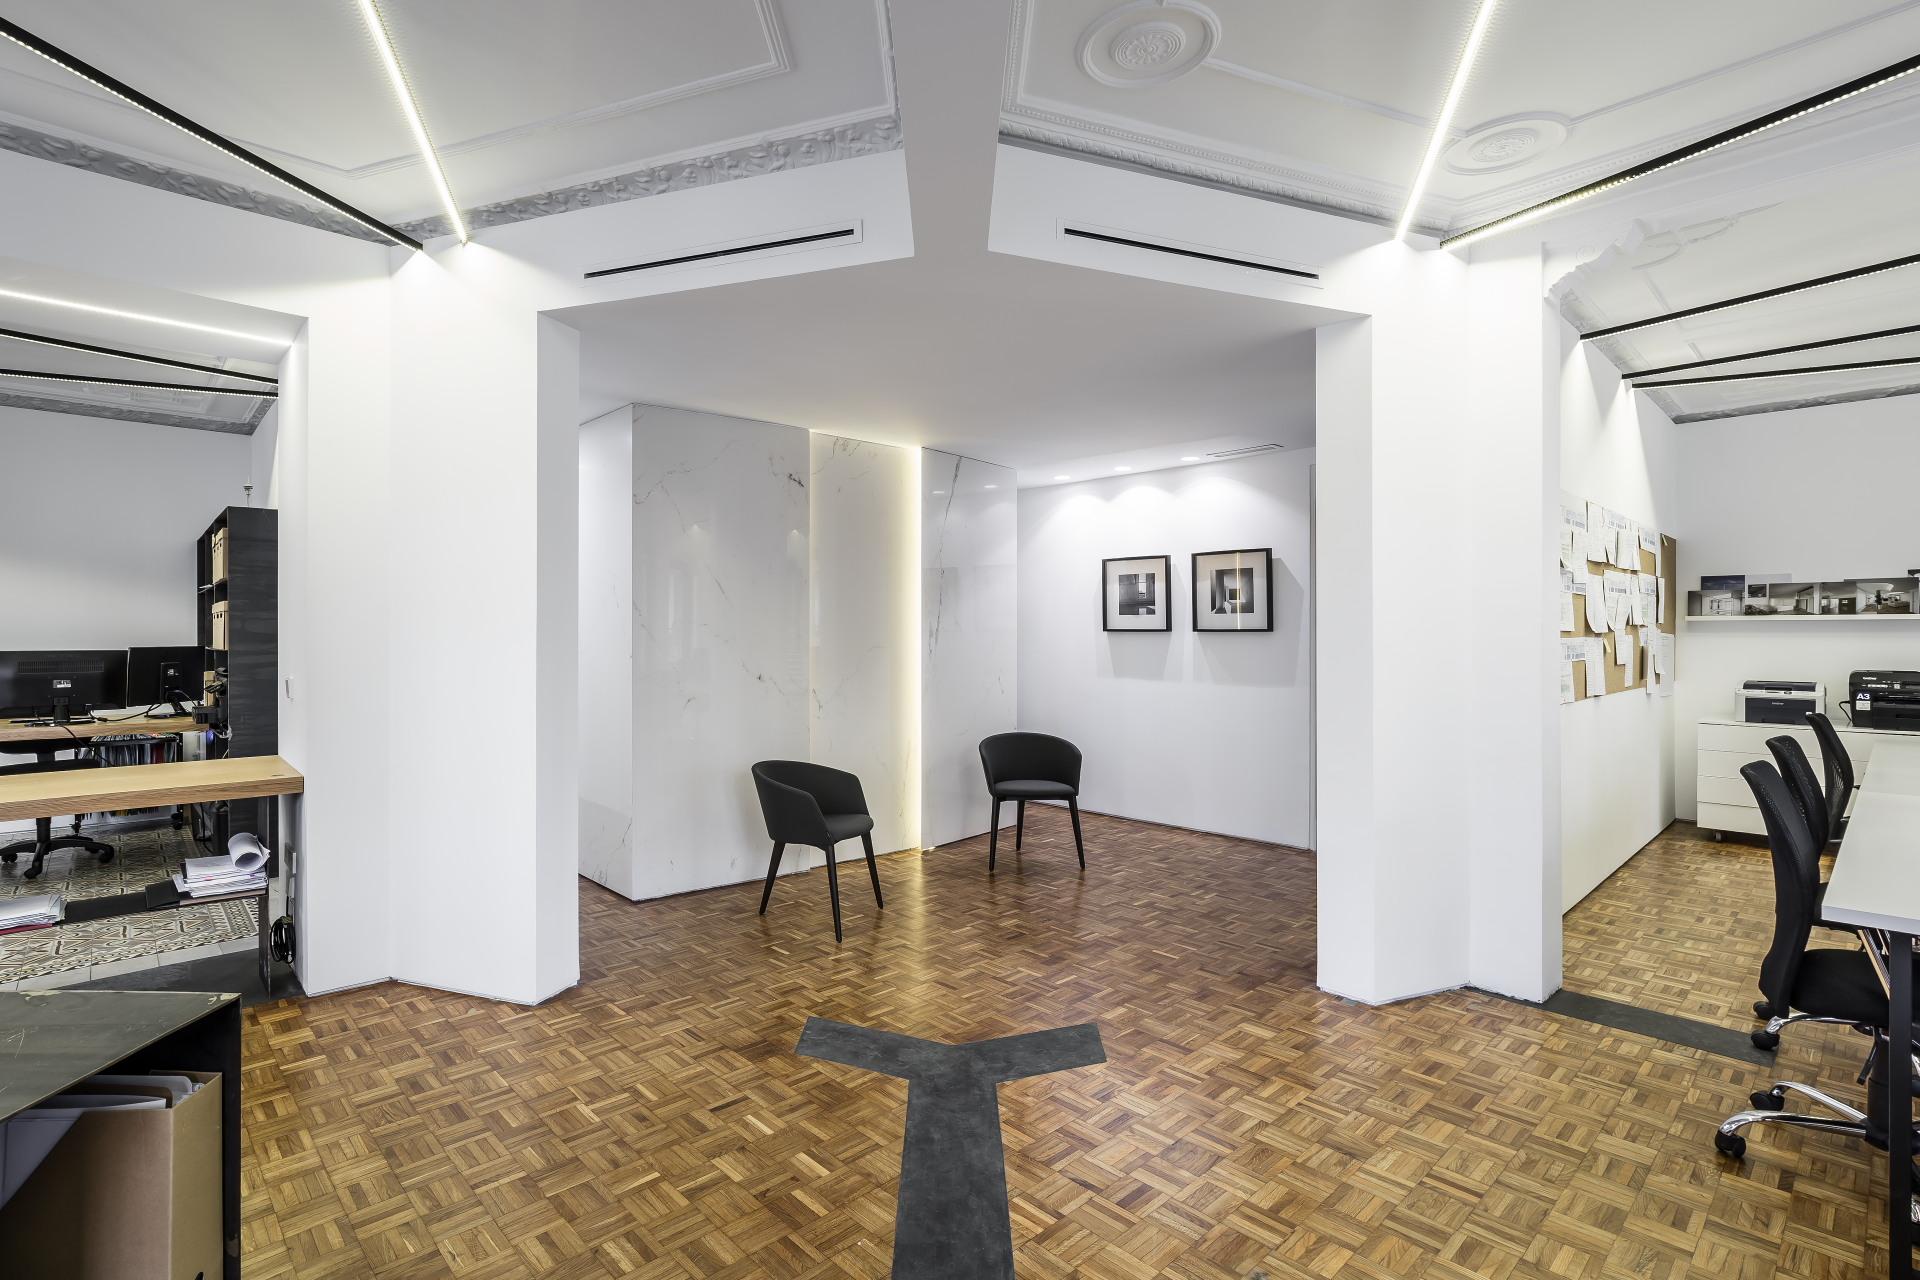 fotografia-arquitectura-interiorismo-valencia-german-cabo-viraje-estudio-pujol (6)